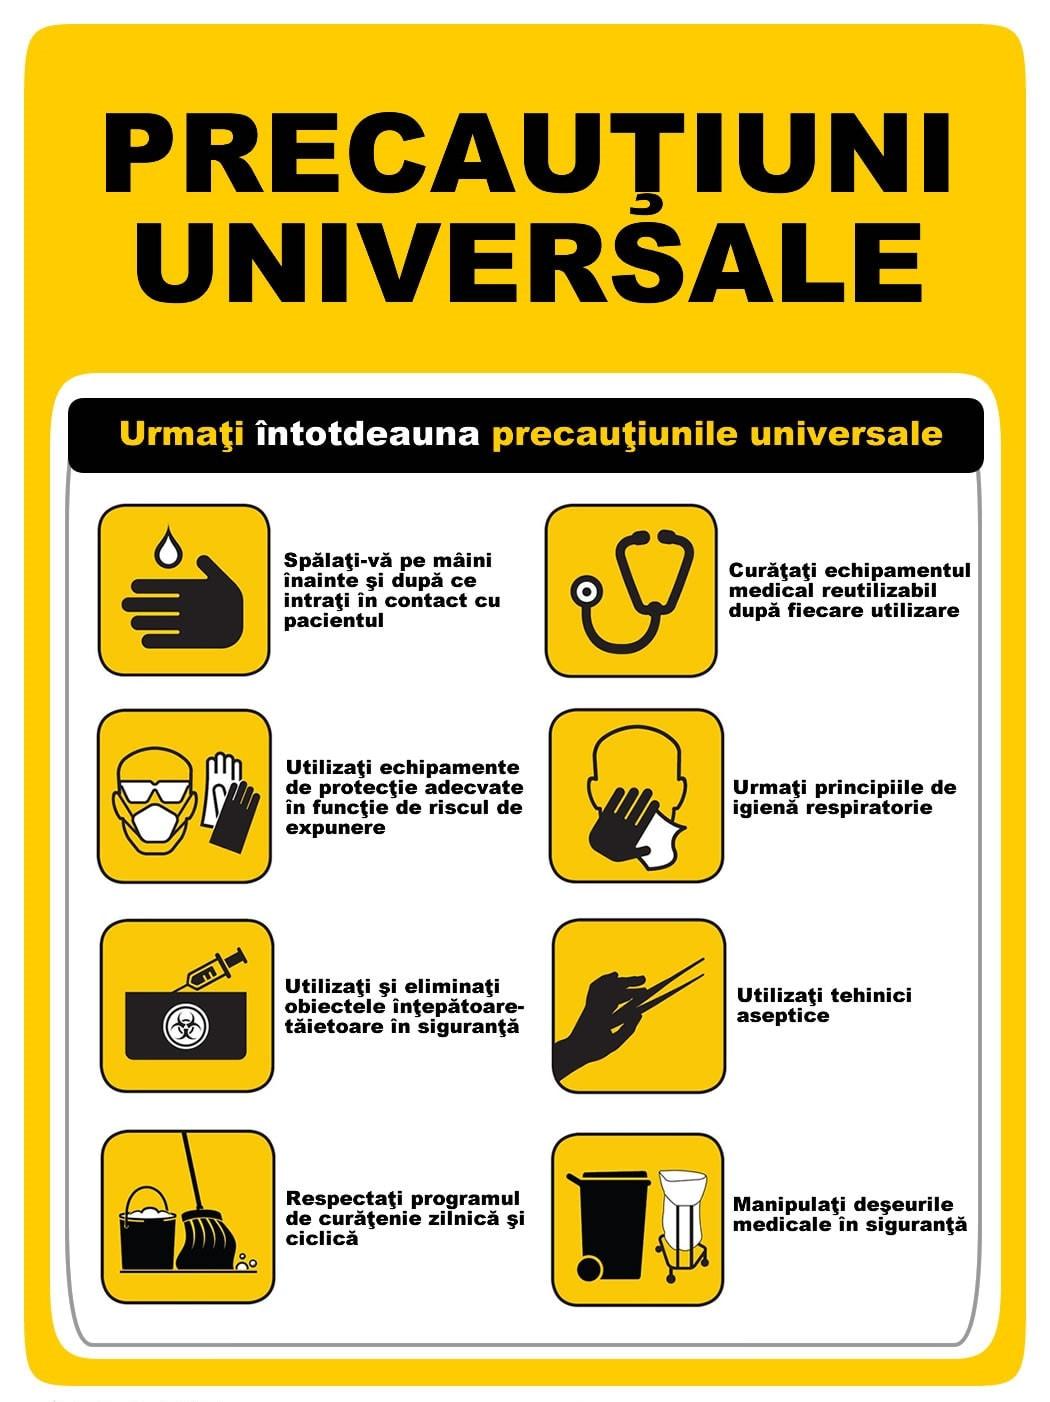 Precautiuni universale